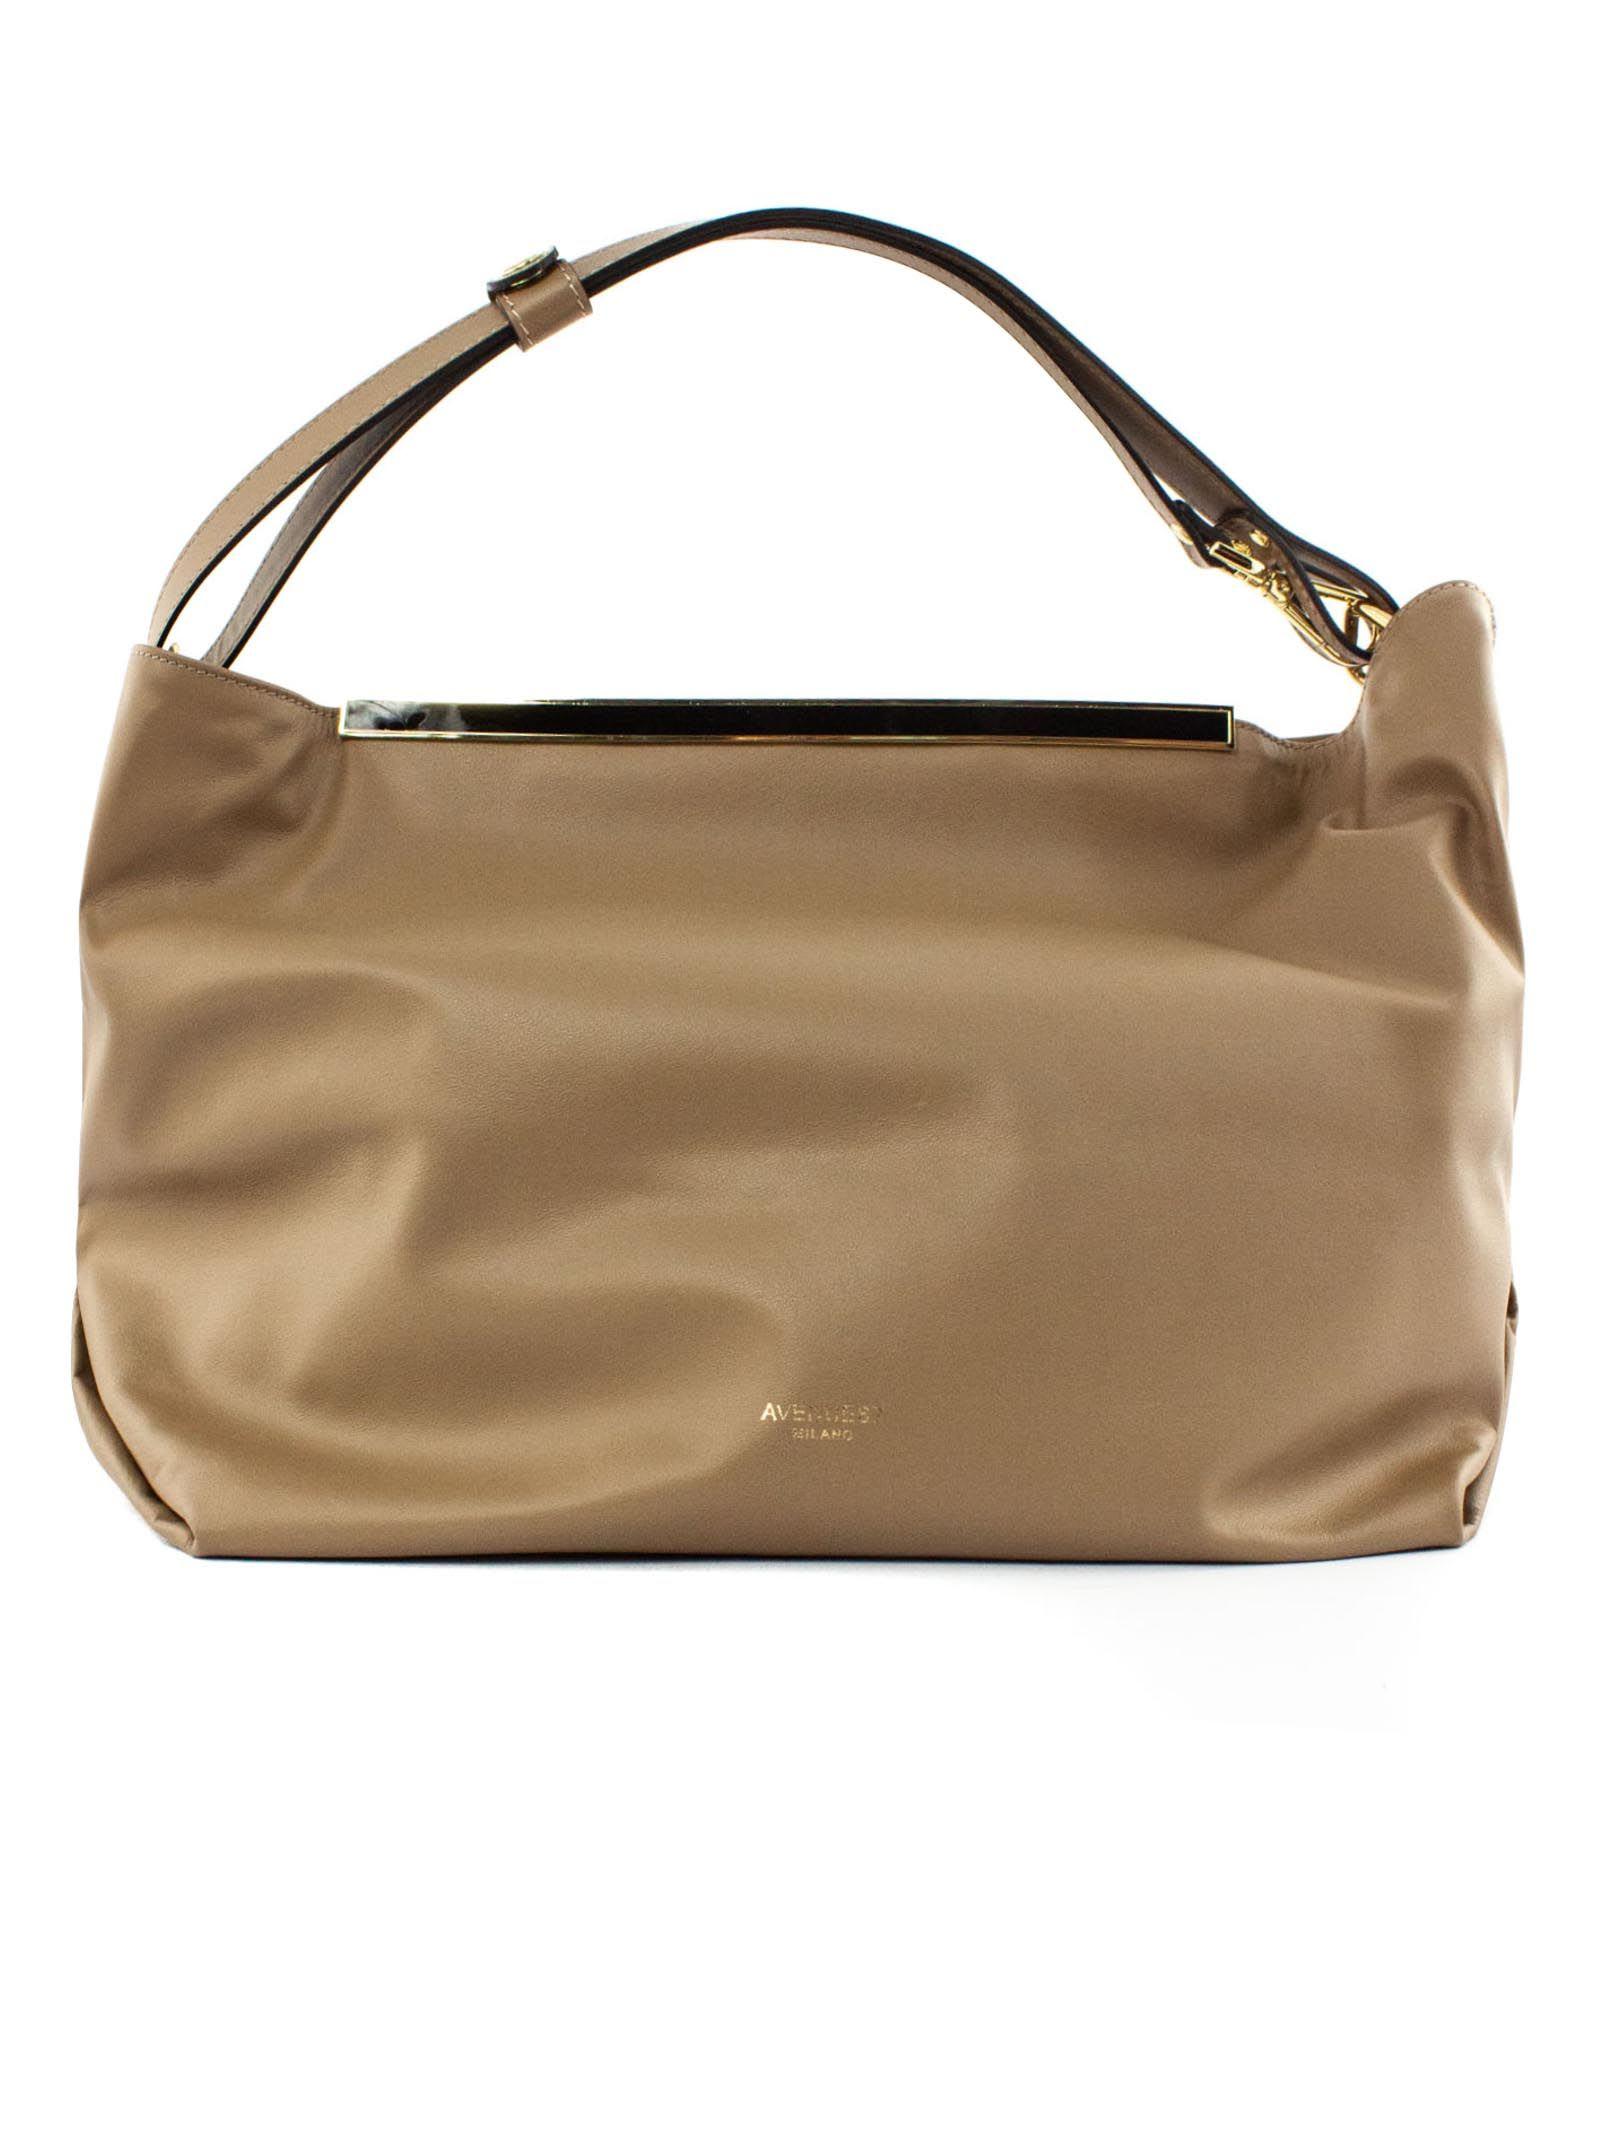 India Shopper In Beige Leather